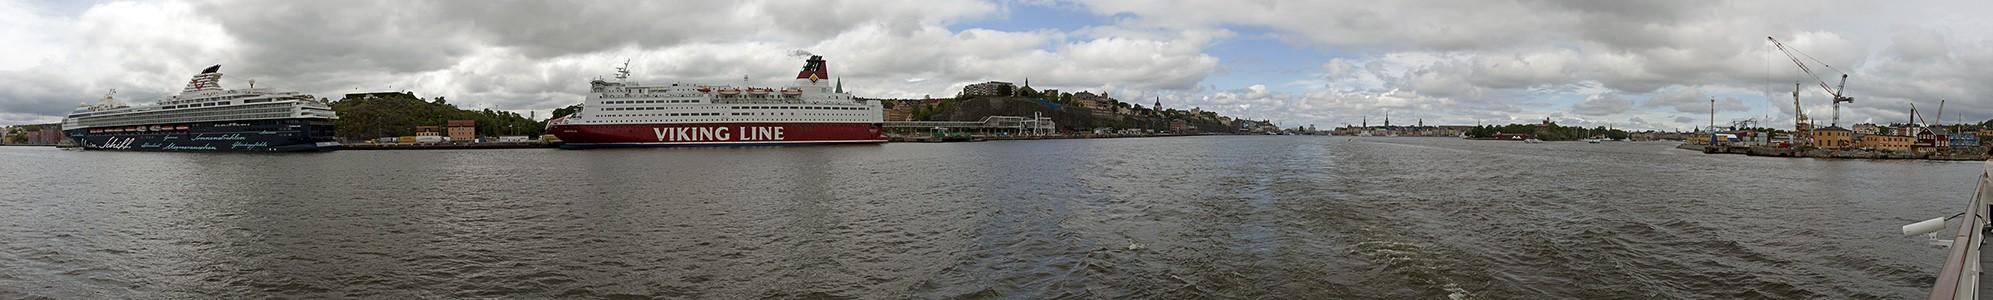 Fähre Stockholm - Vaxholm: Saltsjön Beckholmen Gamla stan Kastellholmen Kreuzfahrterminal Södermalm Viking Line Terminal